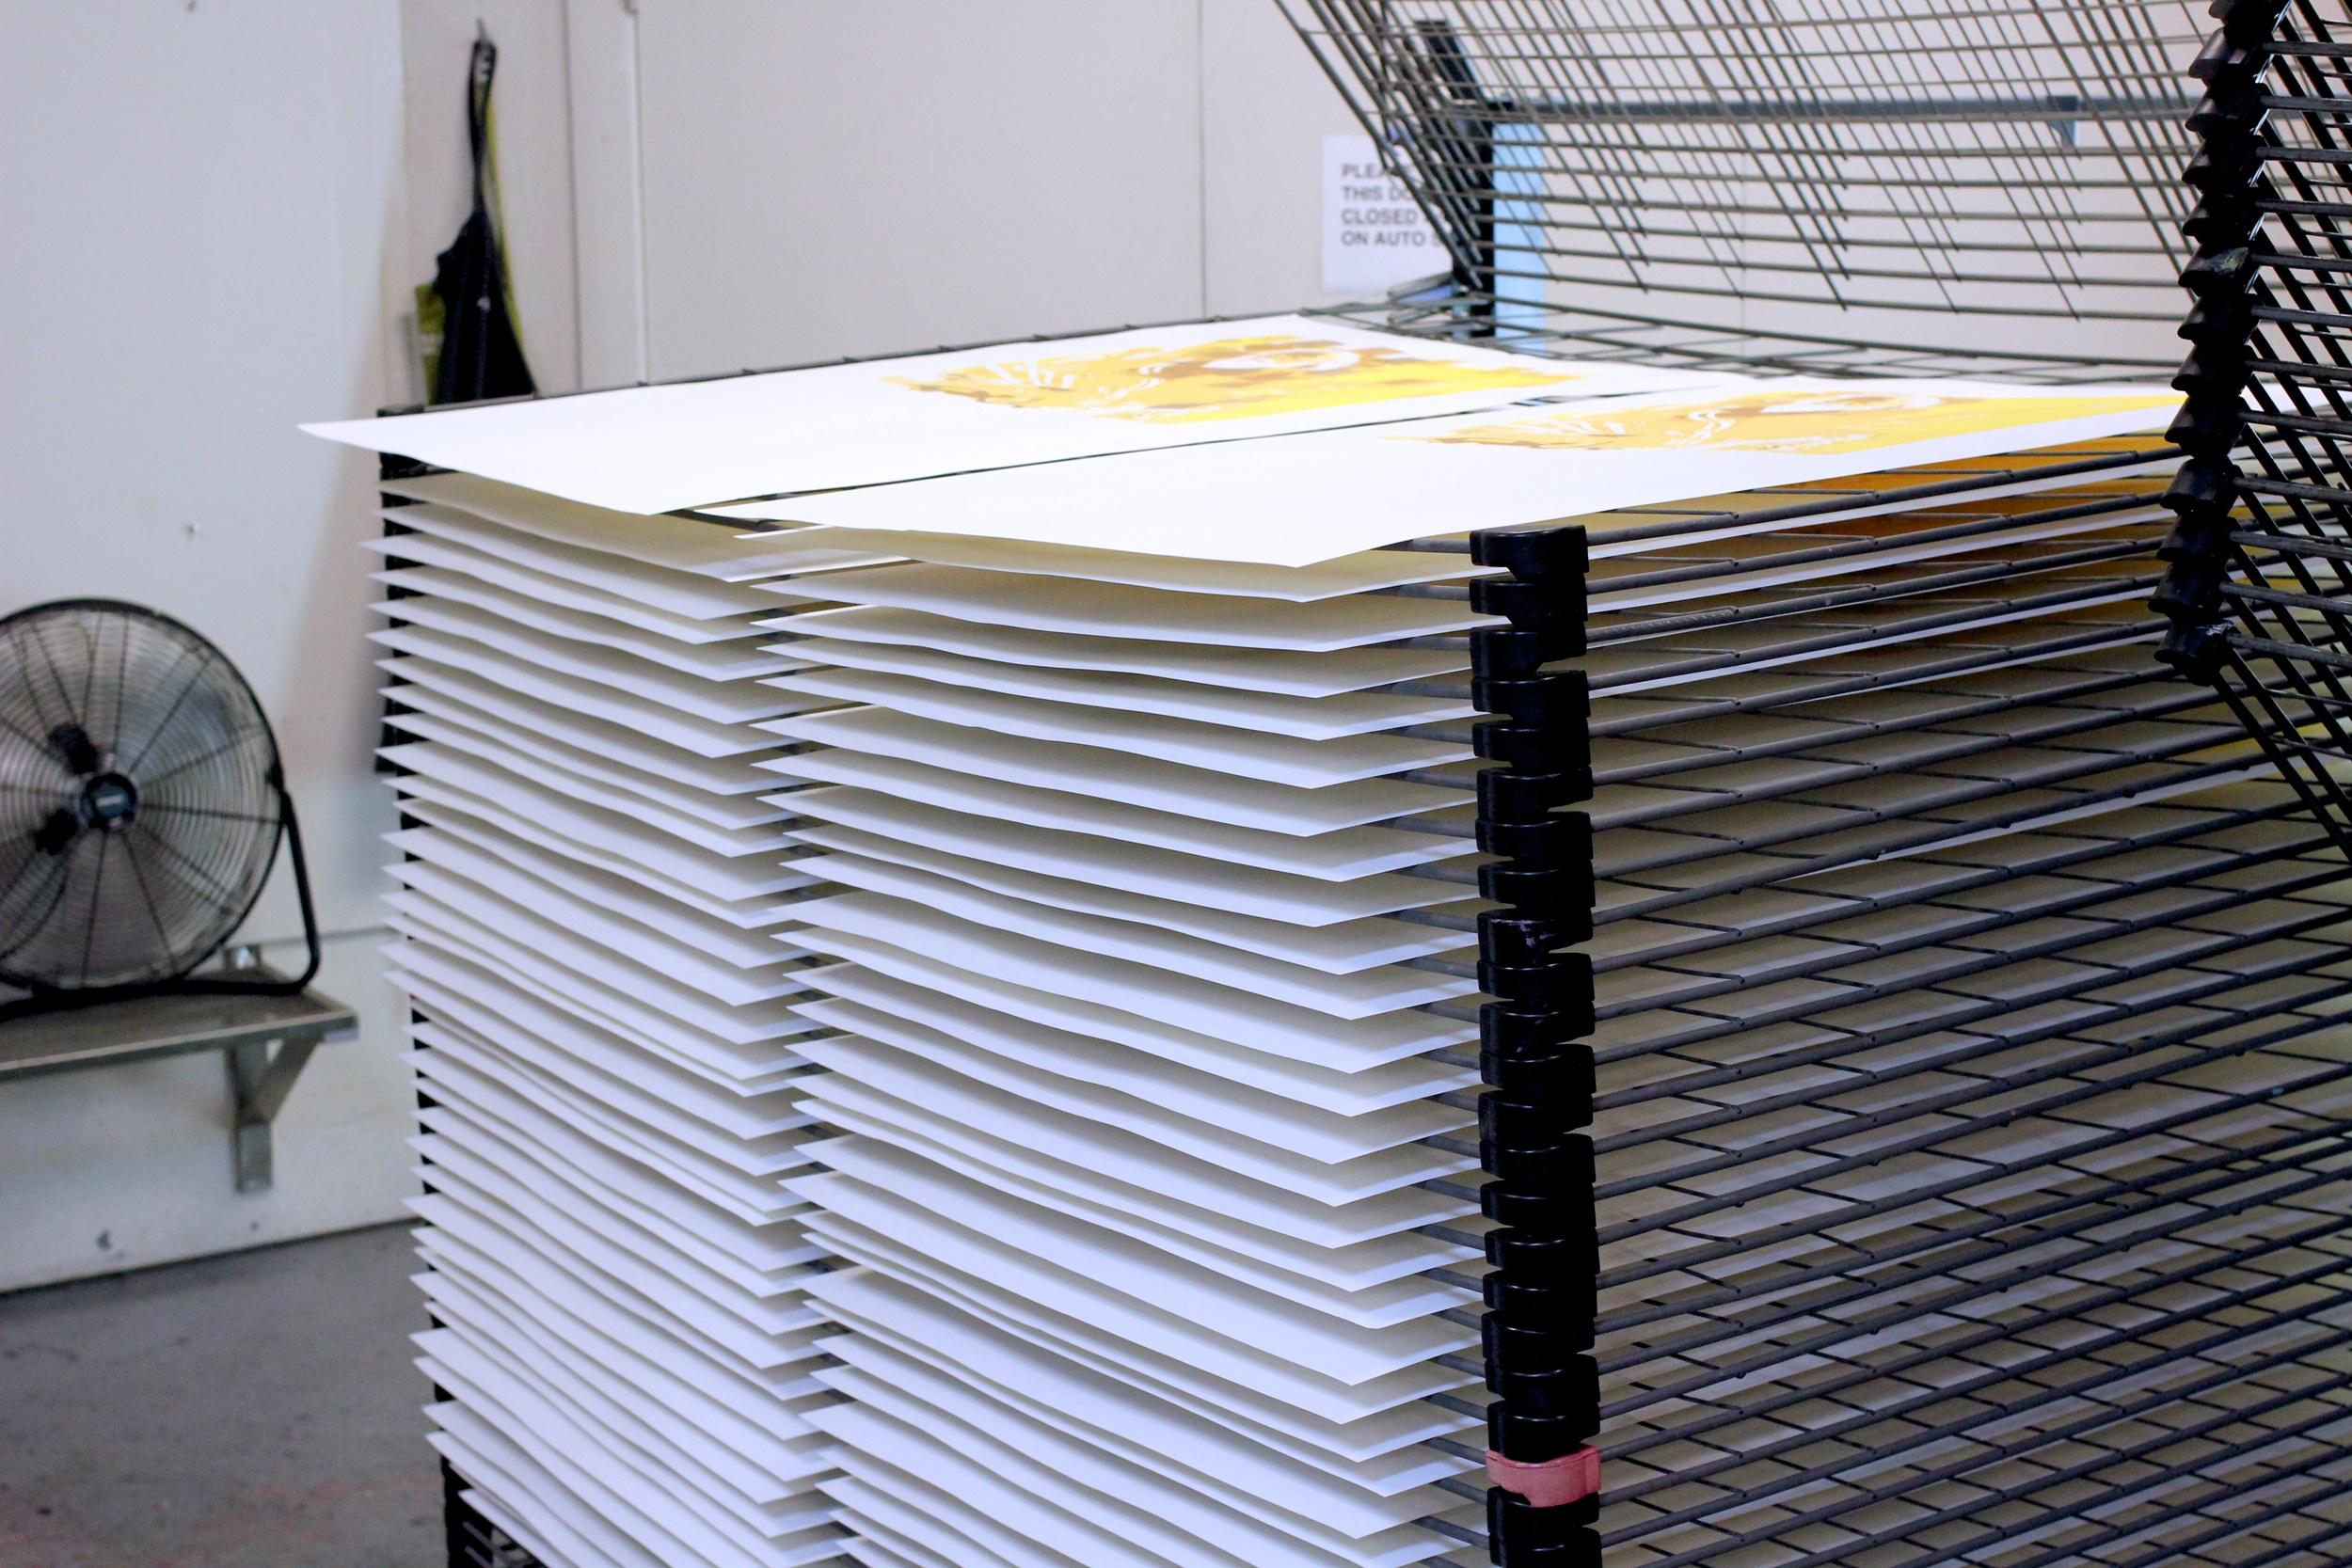 Prints drying in stacks between colors